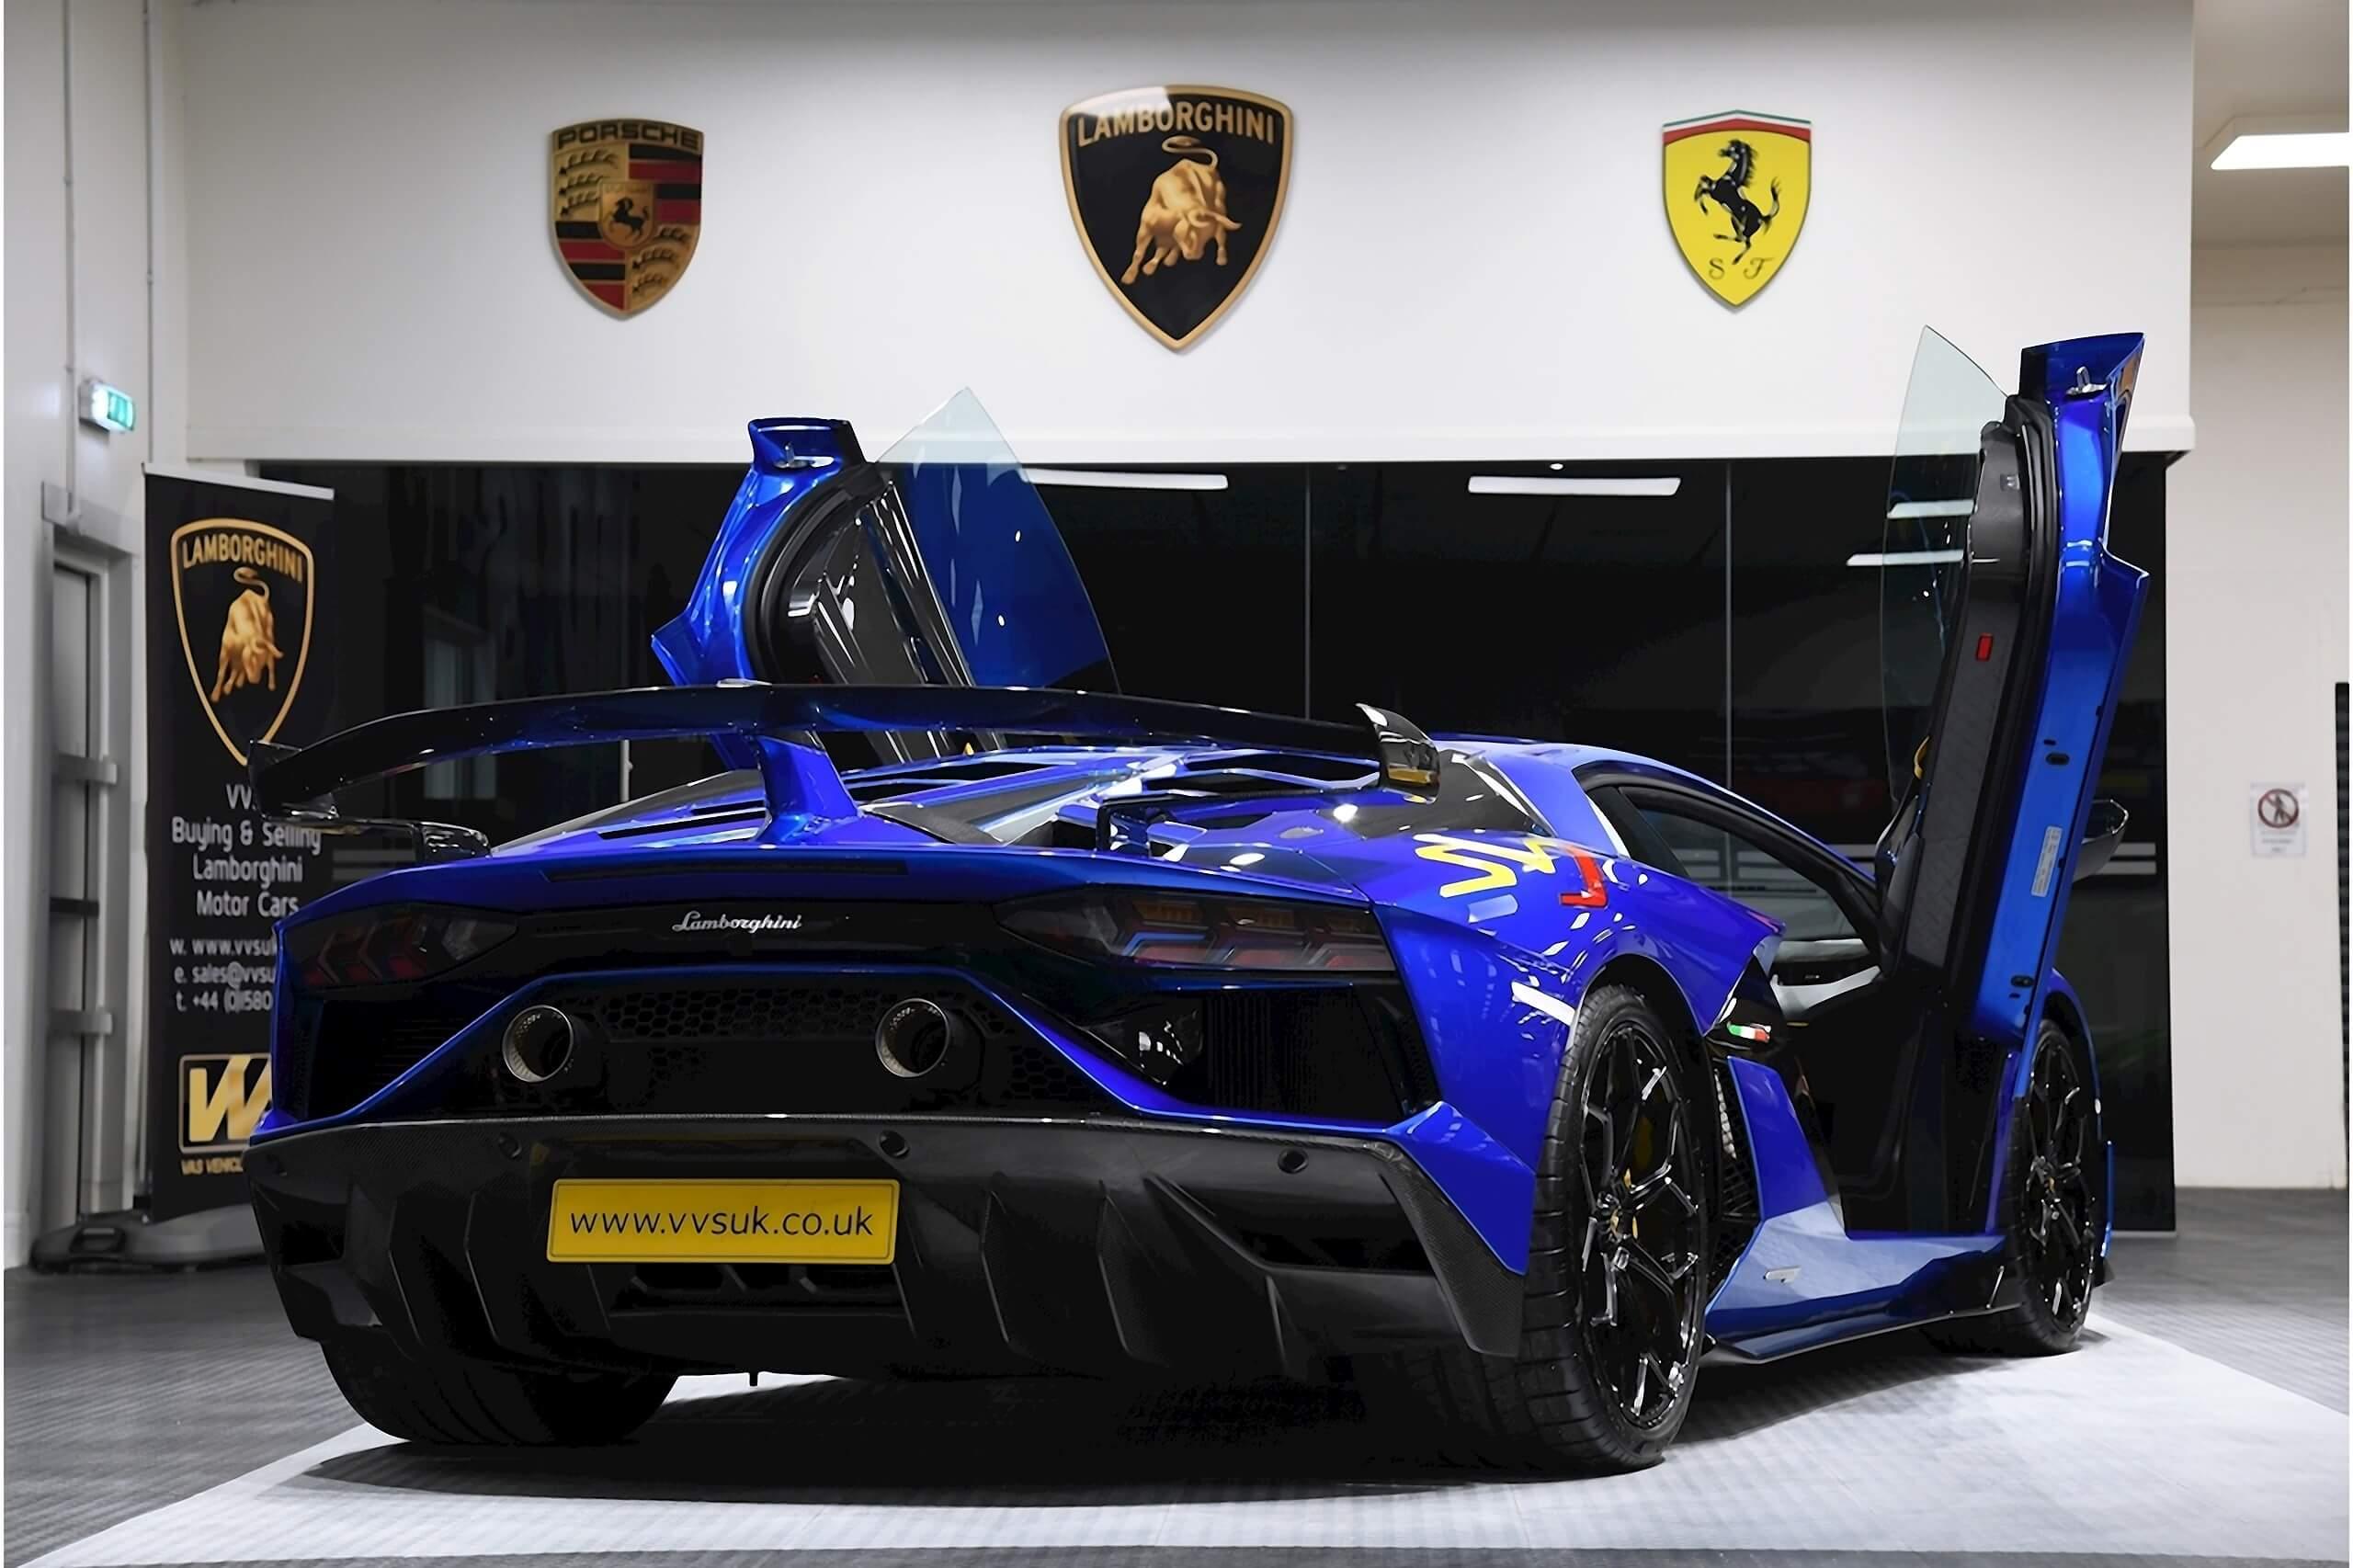 Lamborghini For Sale >> Lamborghini Aventador Svj Lp 770 4